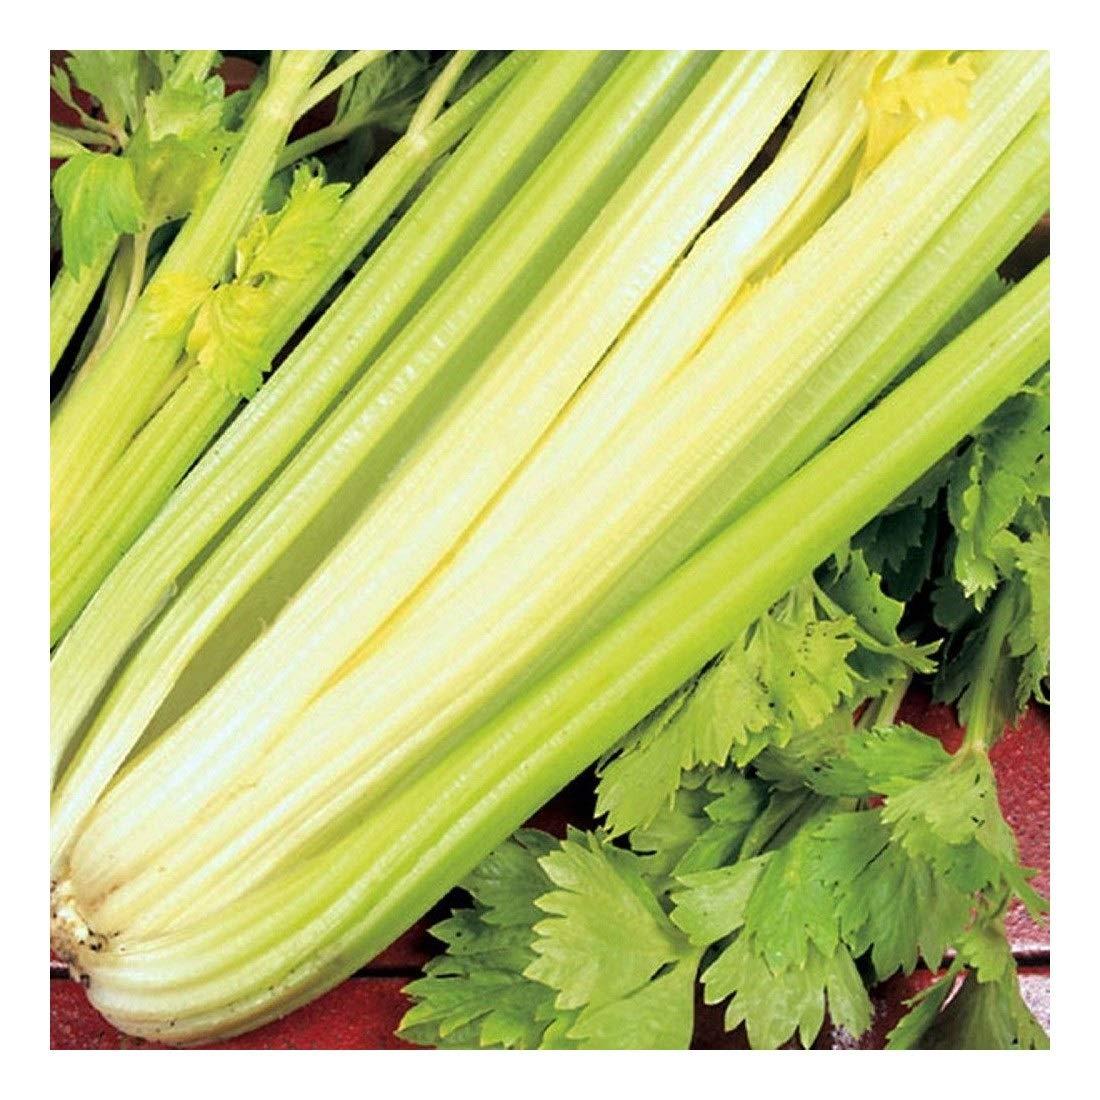 PREMIER SEEDS DIRECT - Celery - Golden SELF BLANCHING - 2GM ~ 6000 Seeds